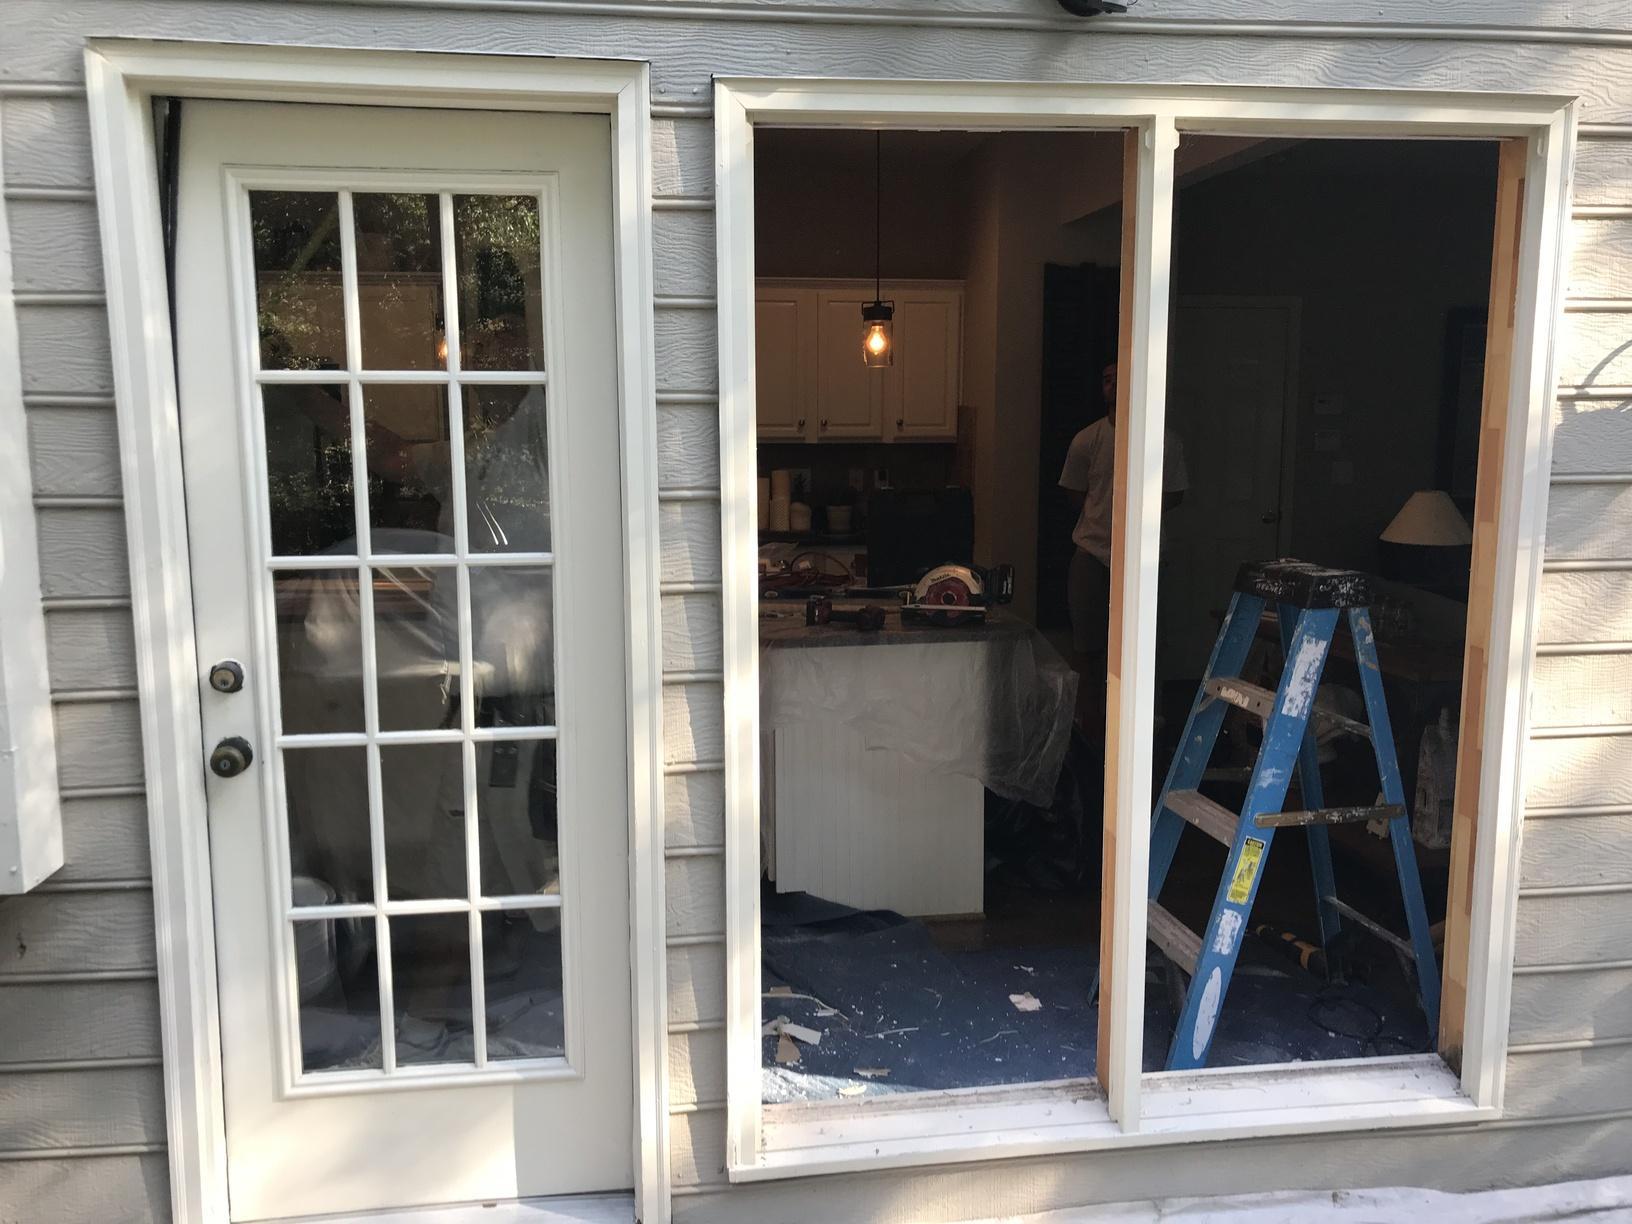 New Great Lakes Window ComfortSmart Premier Series Slider Door - Before Photo